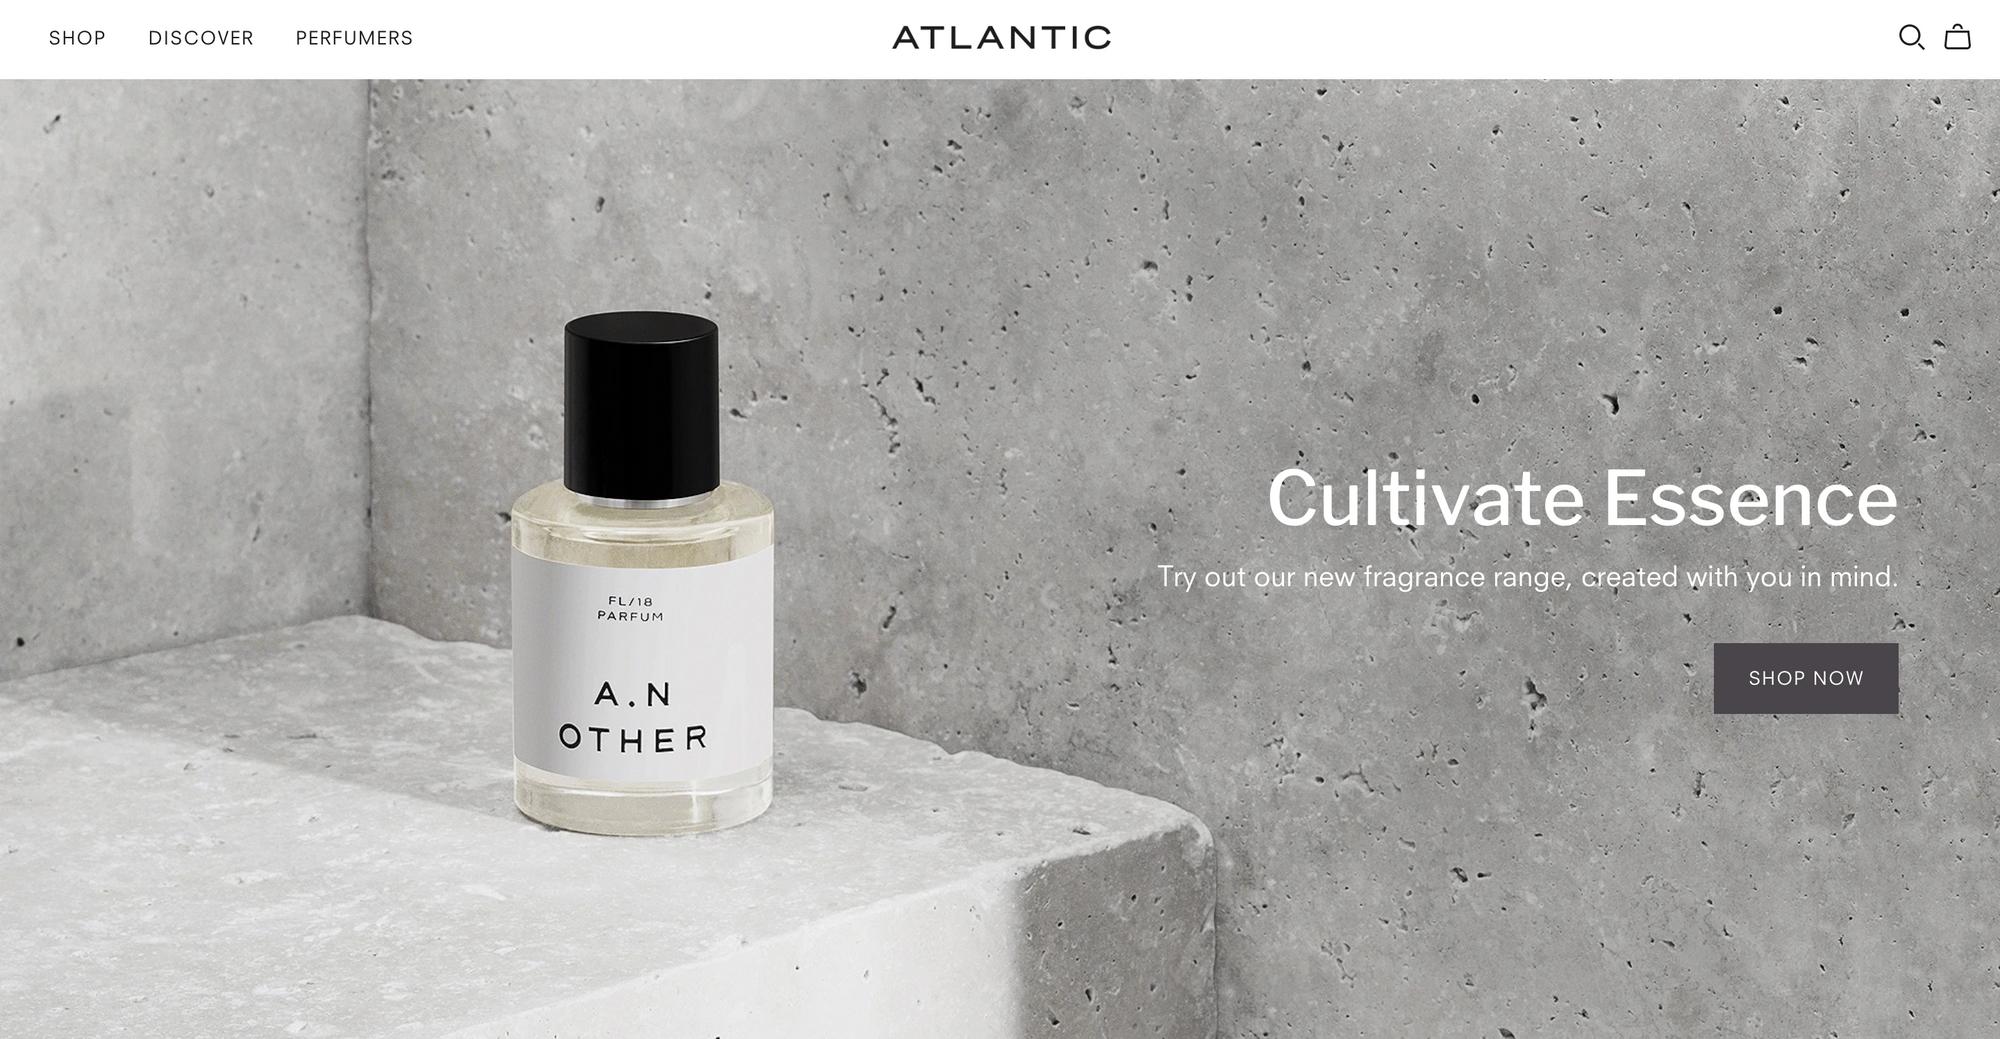 atlantic shopify template